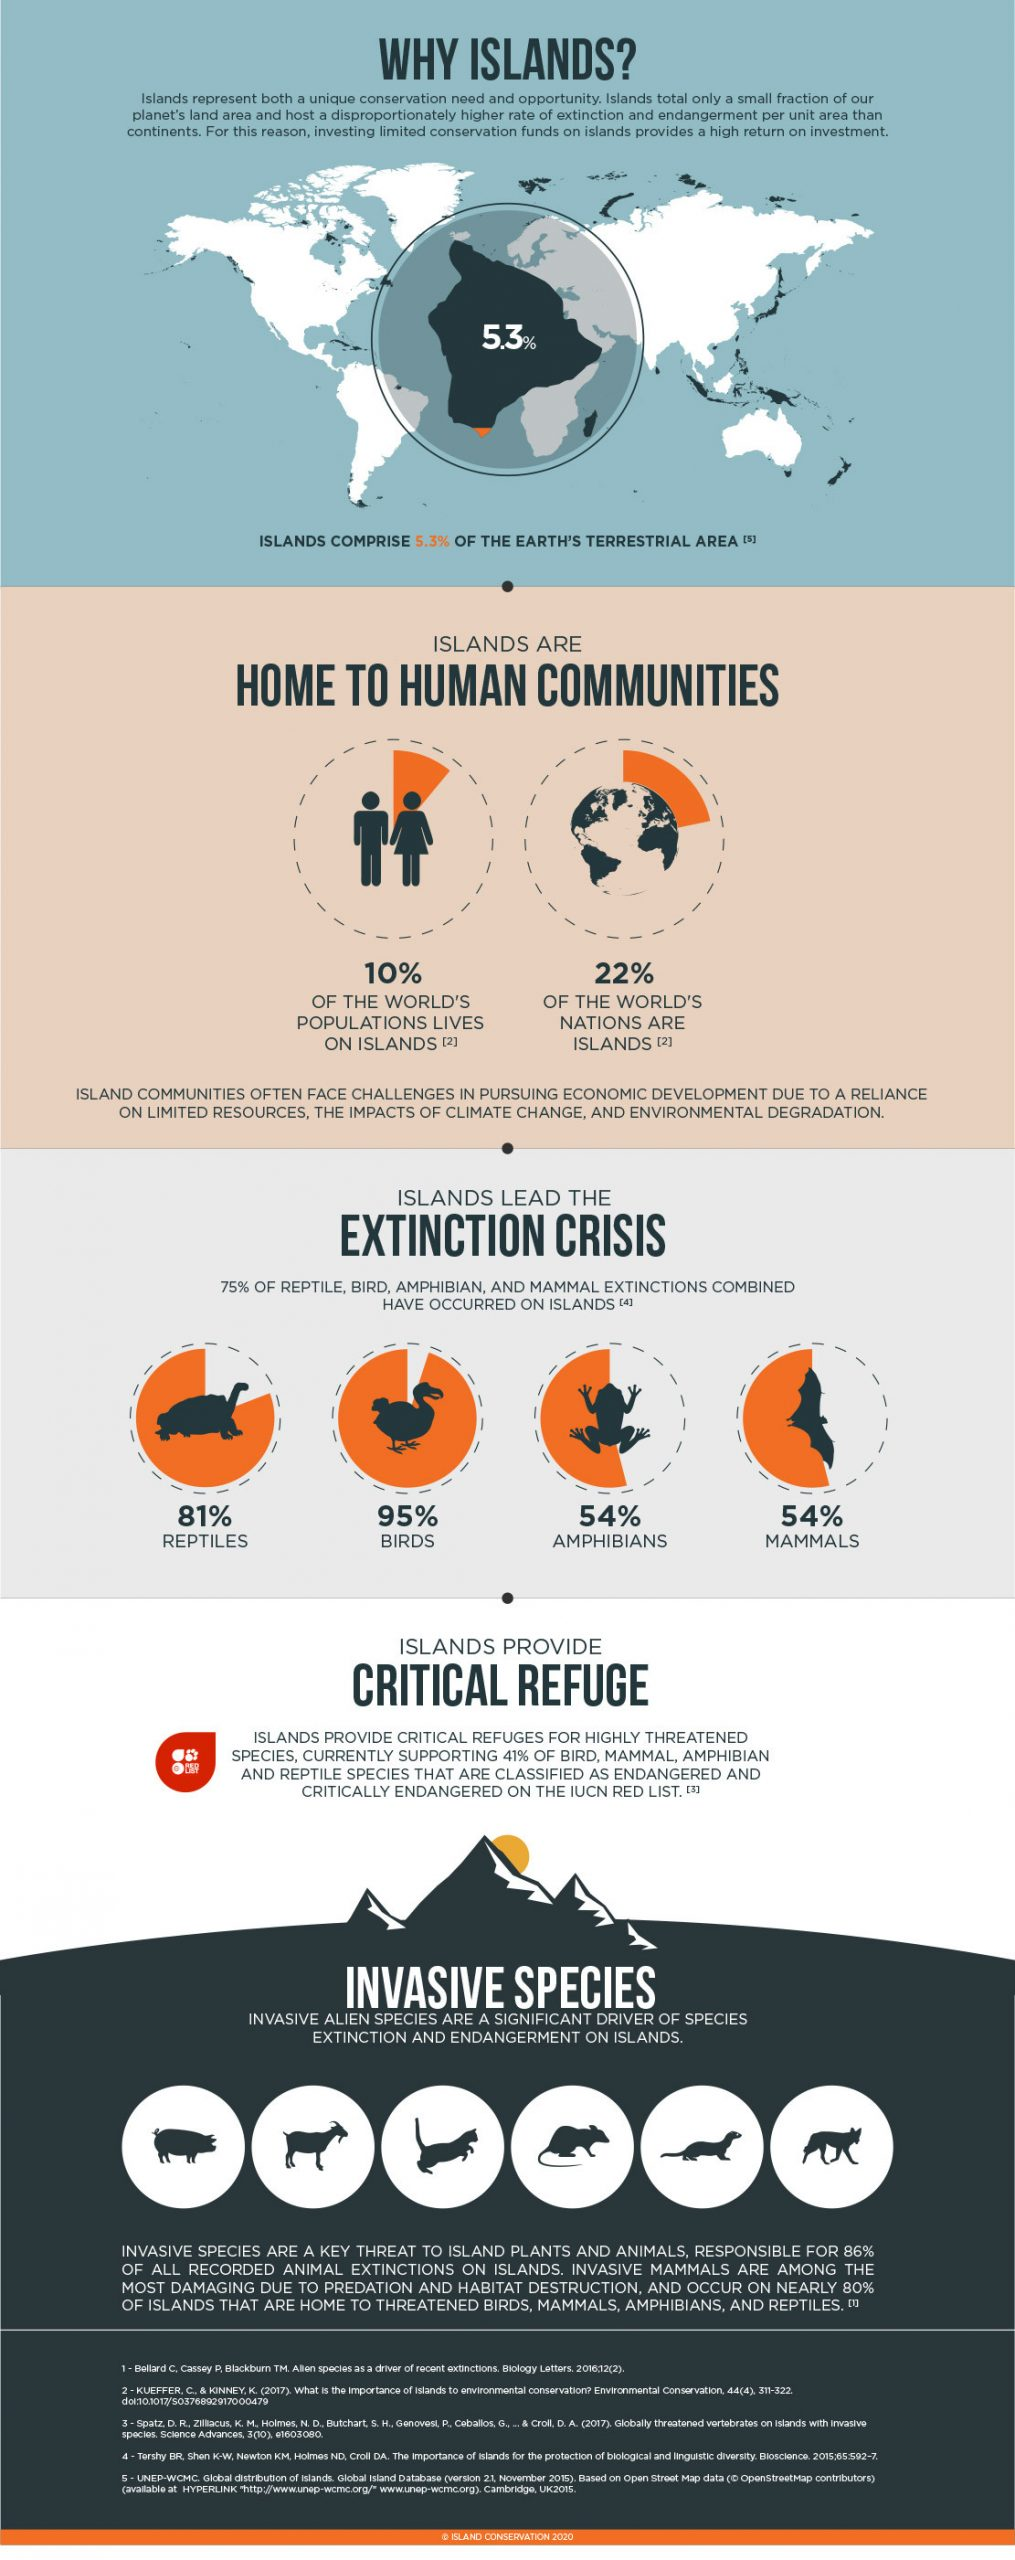 island-conservation--SDG-infographic-full